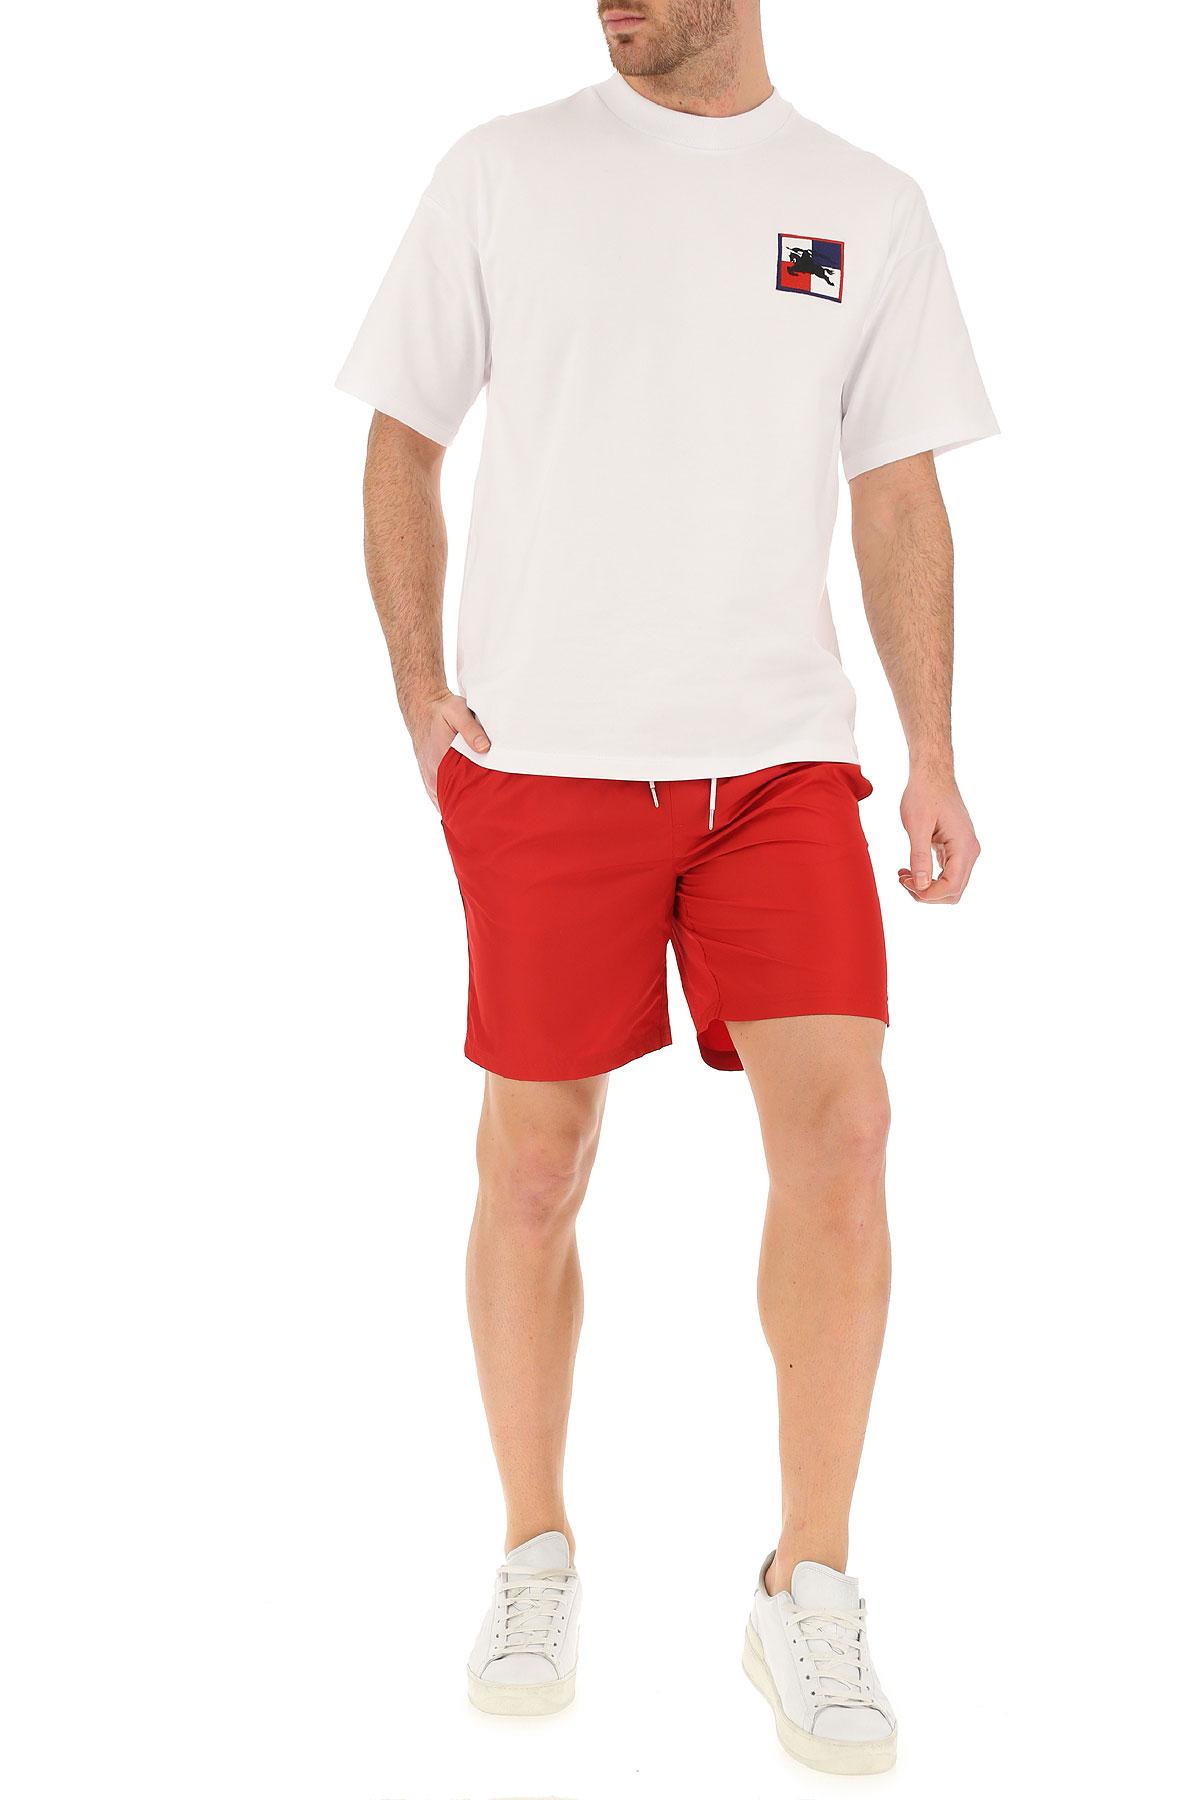 Blanco Rojo Ropa Hombres 2019 Primavera Para Burberry verano 6nqf7H7v